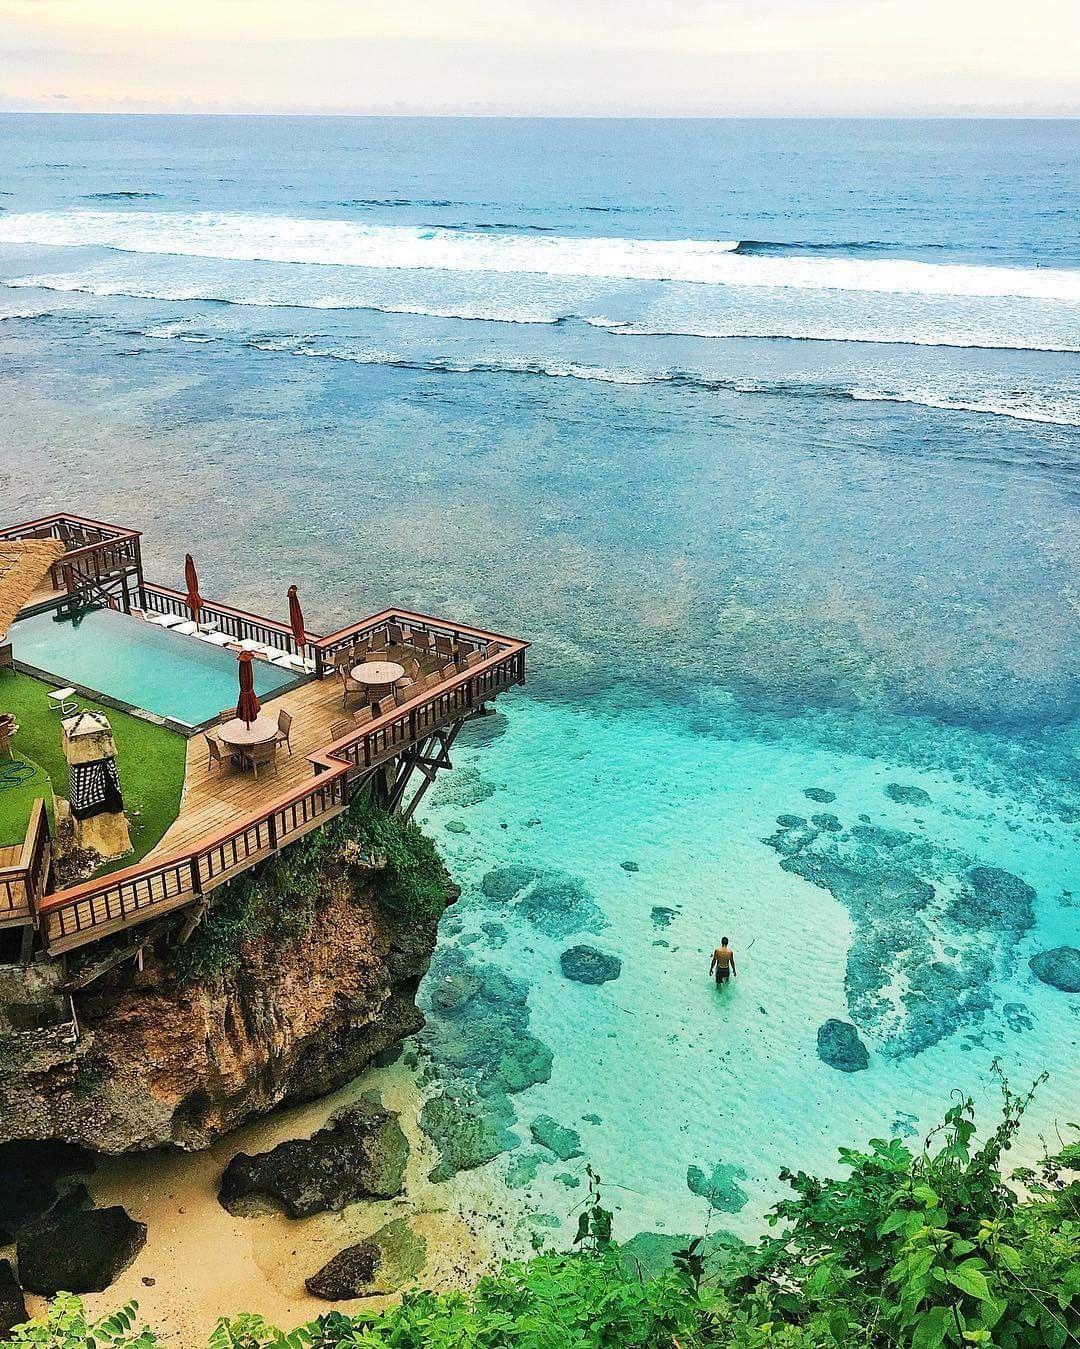 Zoltan Uhlar Suluban Beach Bali Indonesia Bali Travel Bali Travel Guide Bali Beaches